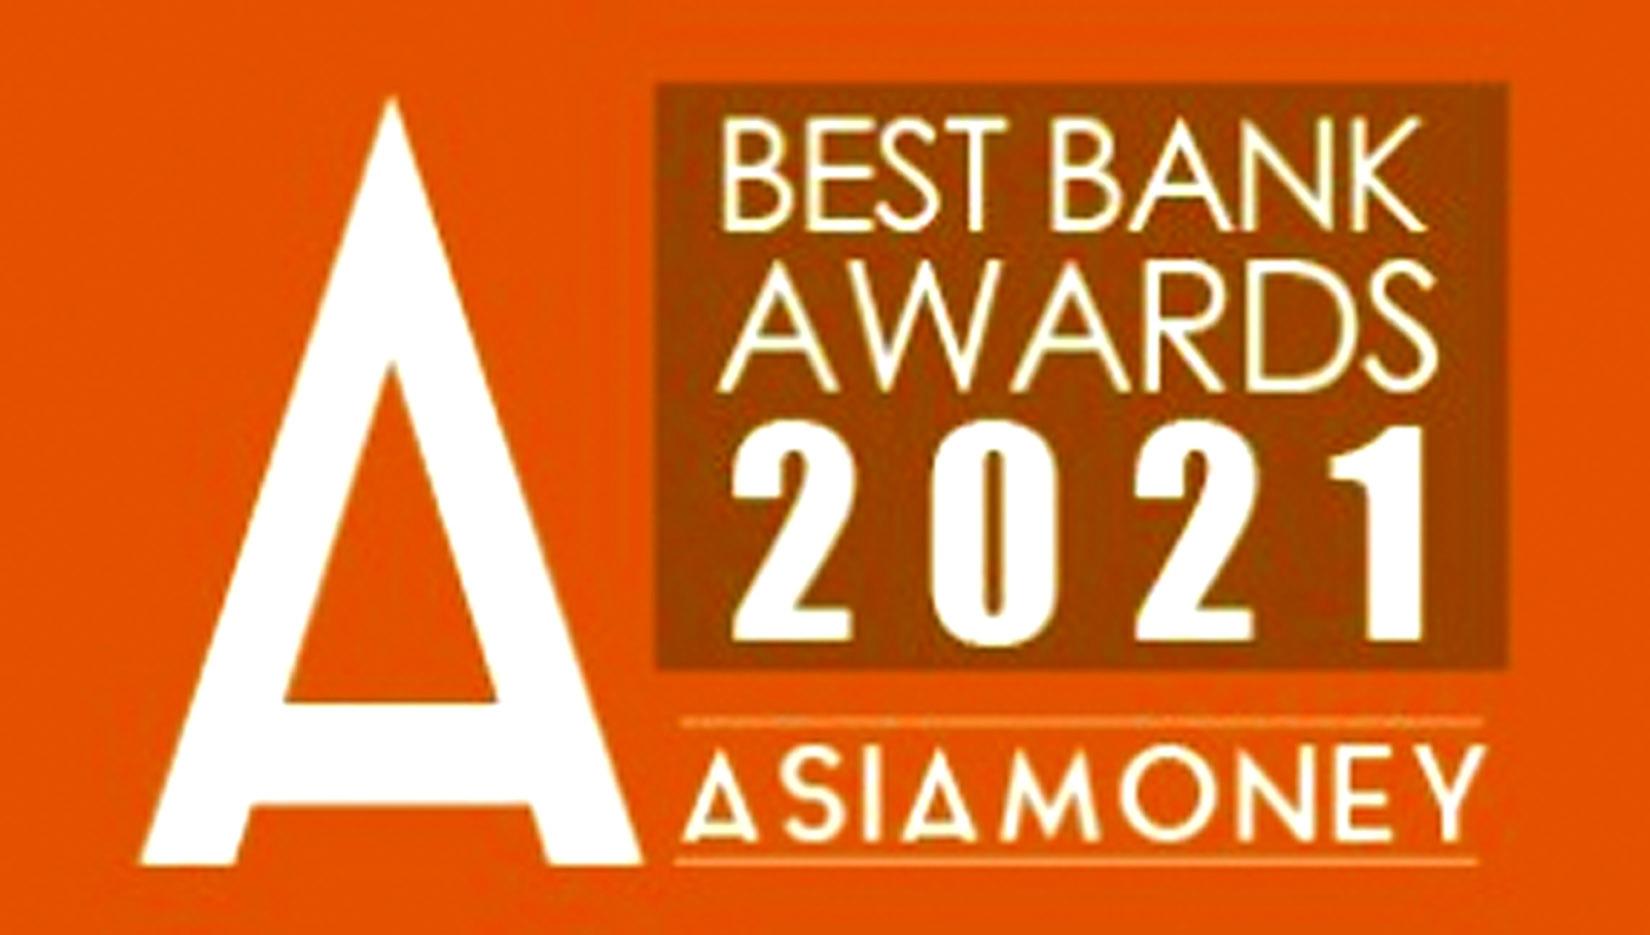 EBL wins Asiamoney best domestic bank 2021 award